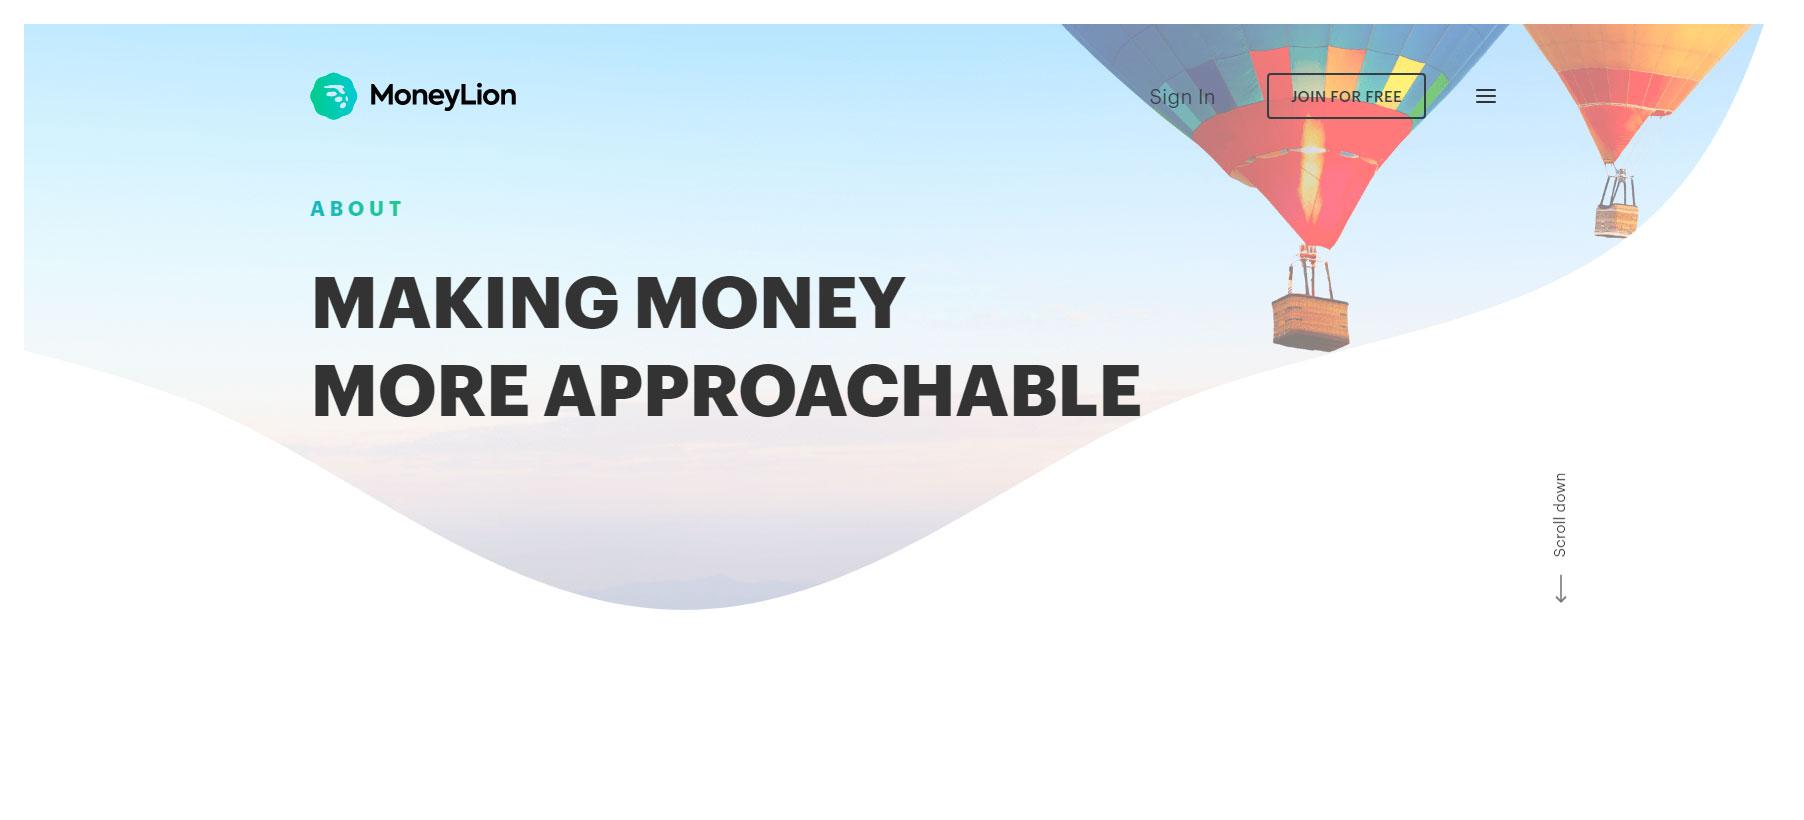 MoneyLion - Website of the Day